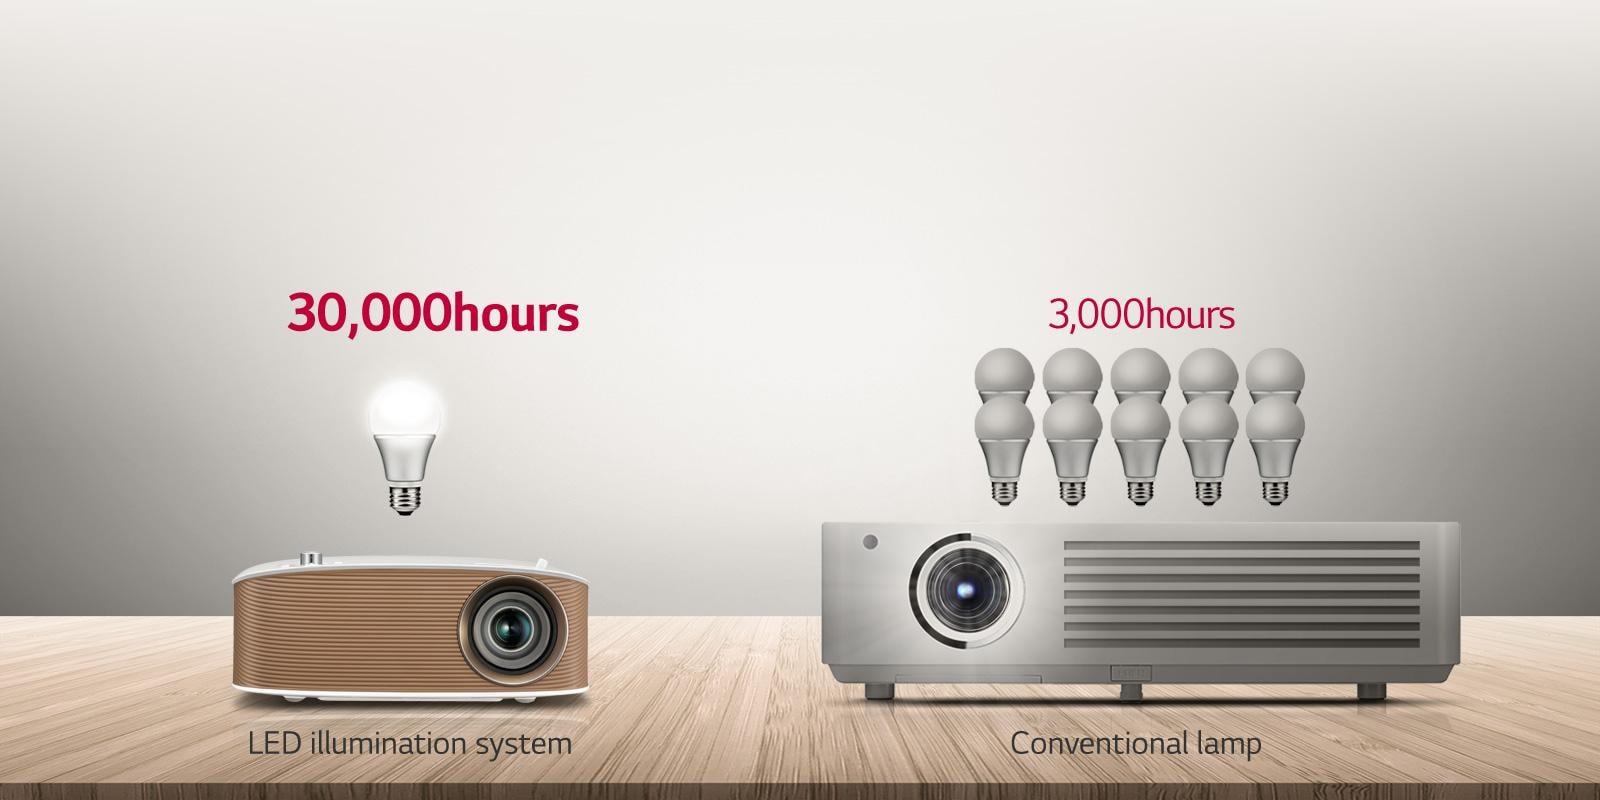 Lg minibeam nano 130 lumen hd lcos pico projector ph150g b amp h - 30 000 Hours Of Entertainment